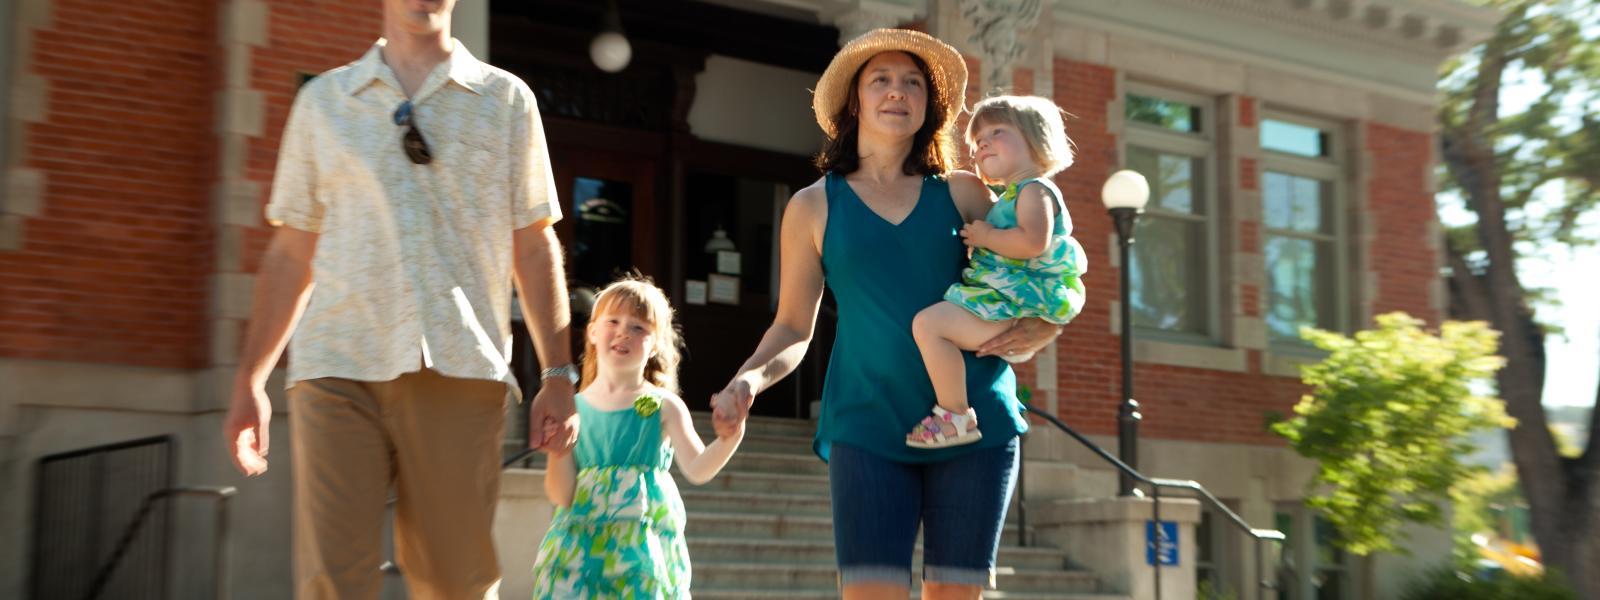 familiy walking, carnegie library_TravelPaso.com credit